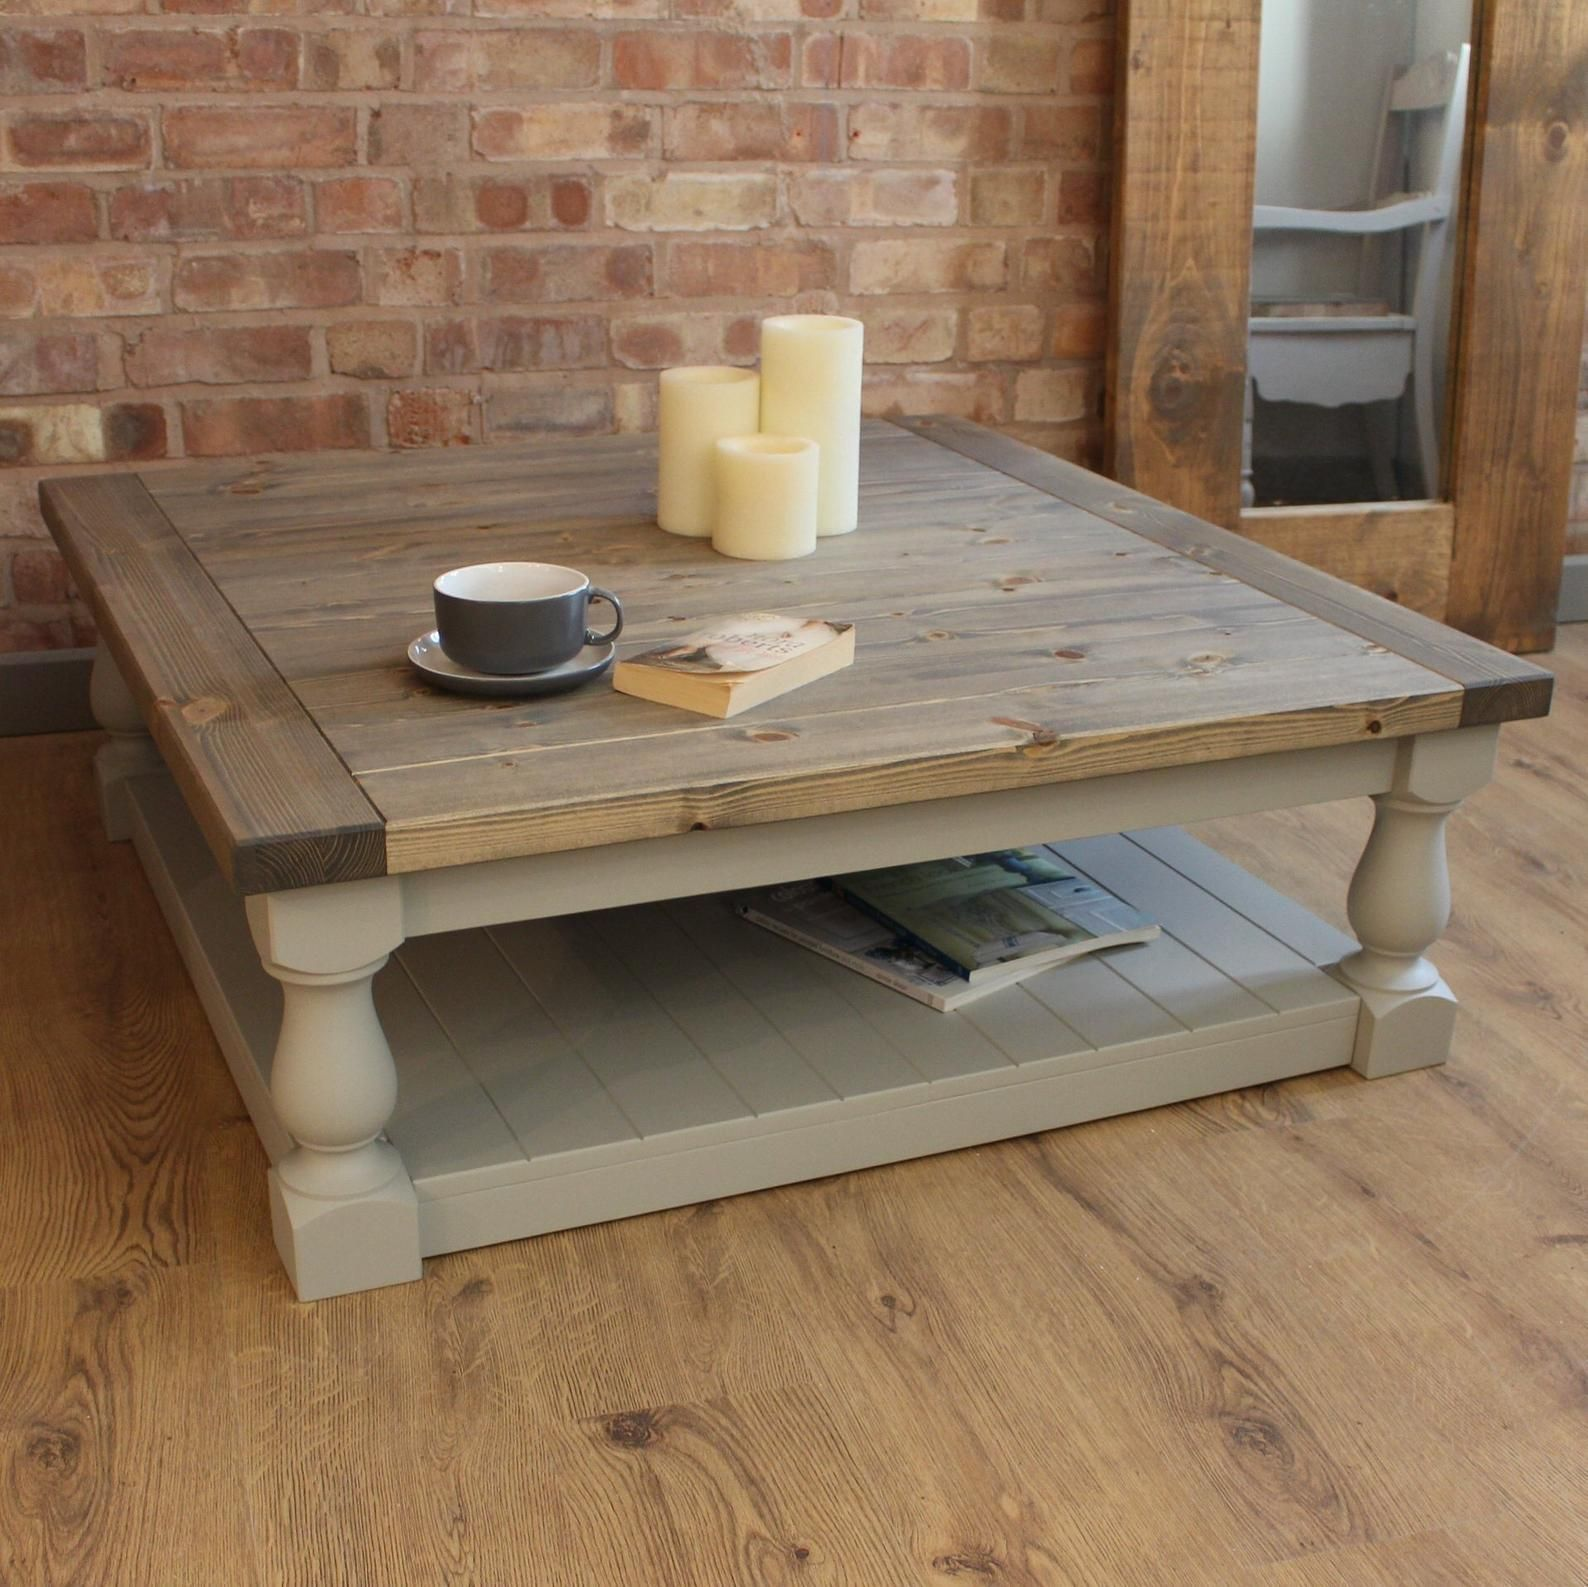 Large Square Handmade Solid Pine Farmhouse Coffee Table Etsy Painted Coffee Tables Coffee Table Farmhouse Round Wood Coffee Table [ 1587 x 1588 Pixel ]